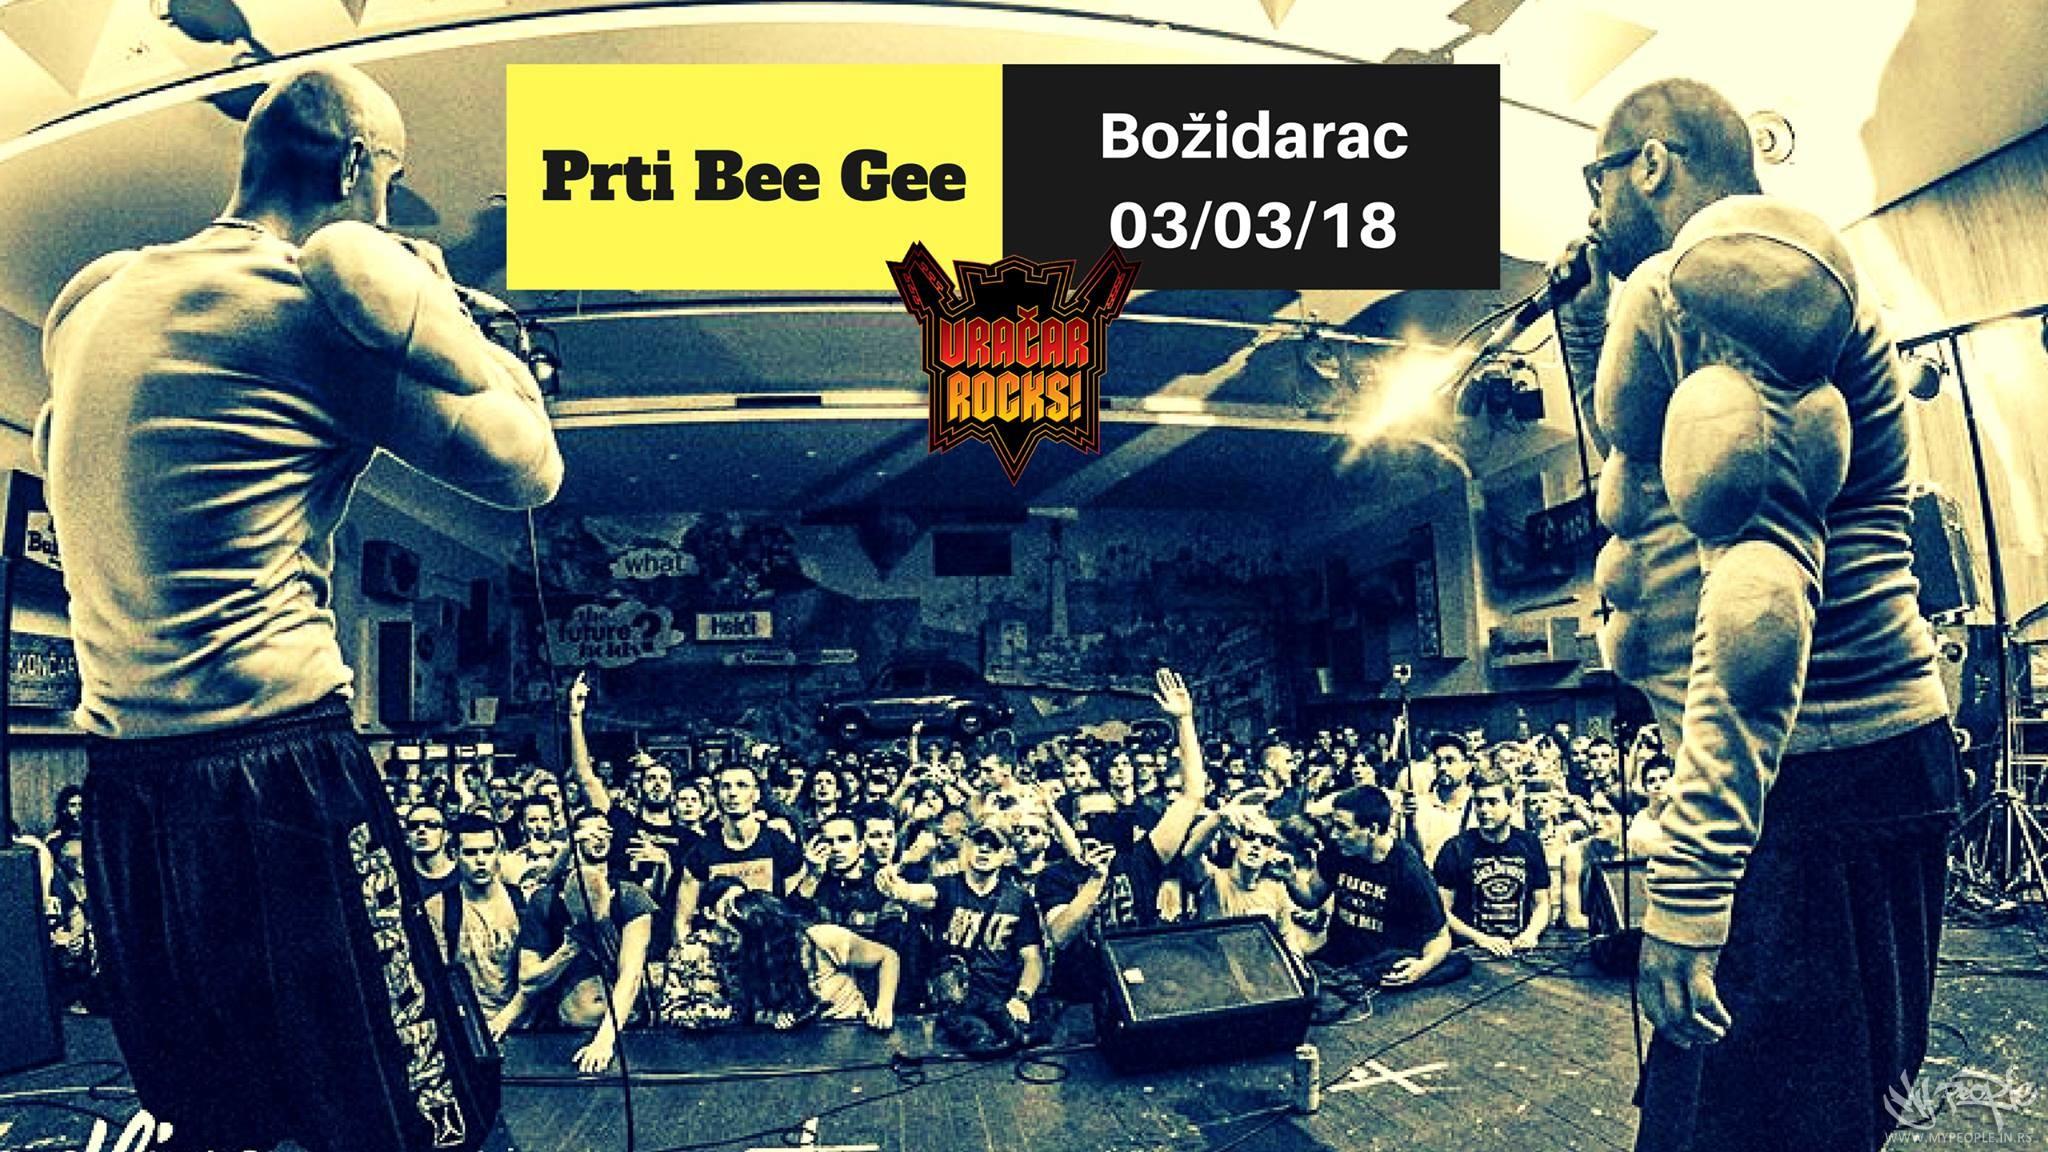 Prti Bee Gee @ Božidarac